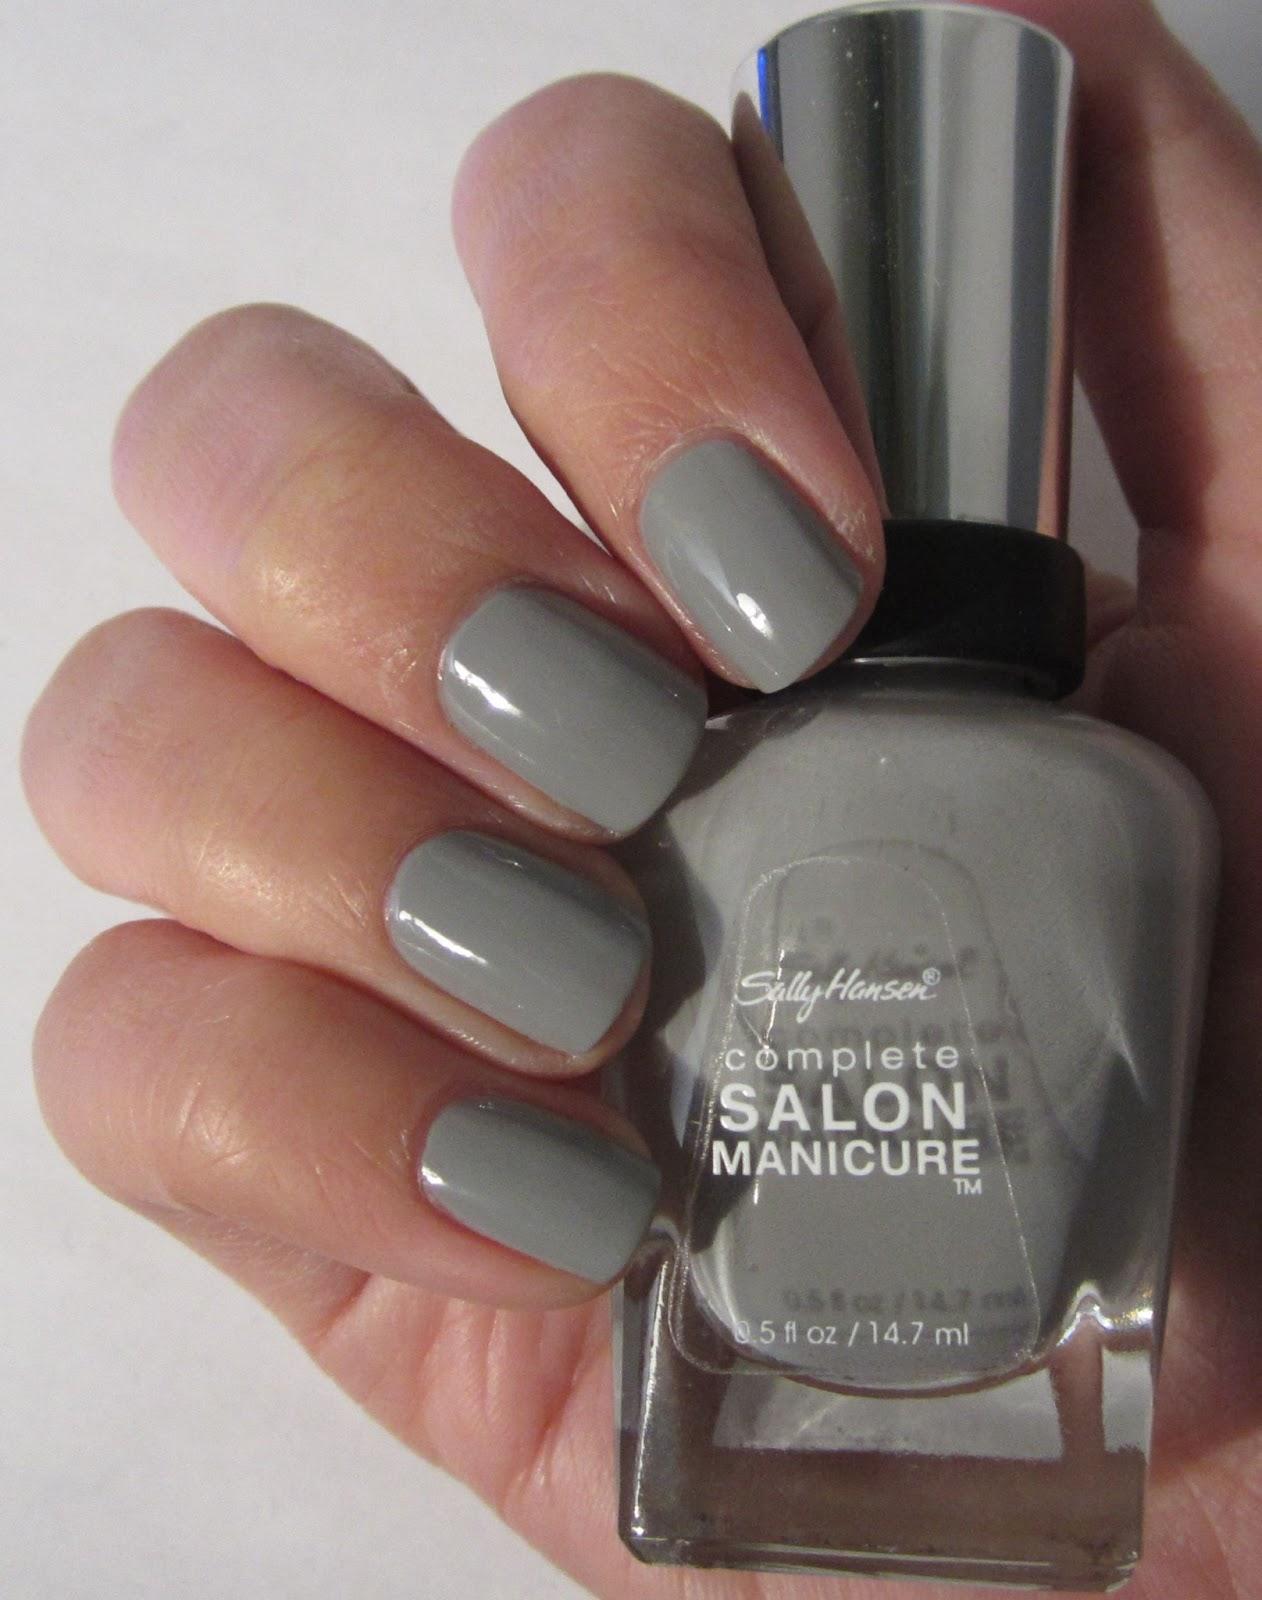 the nailbourhood: sally hansen complete salon manicure dorian grey